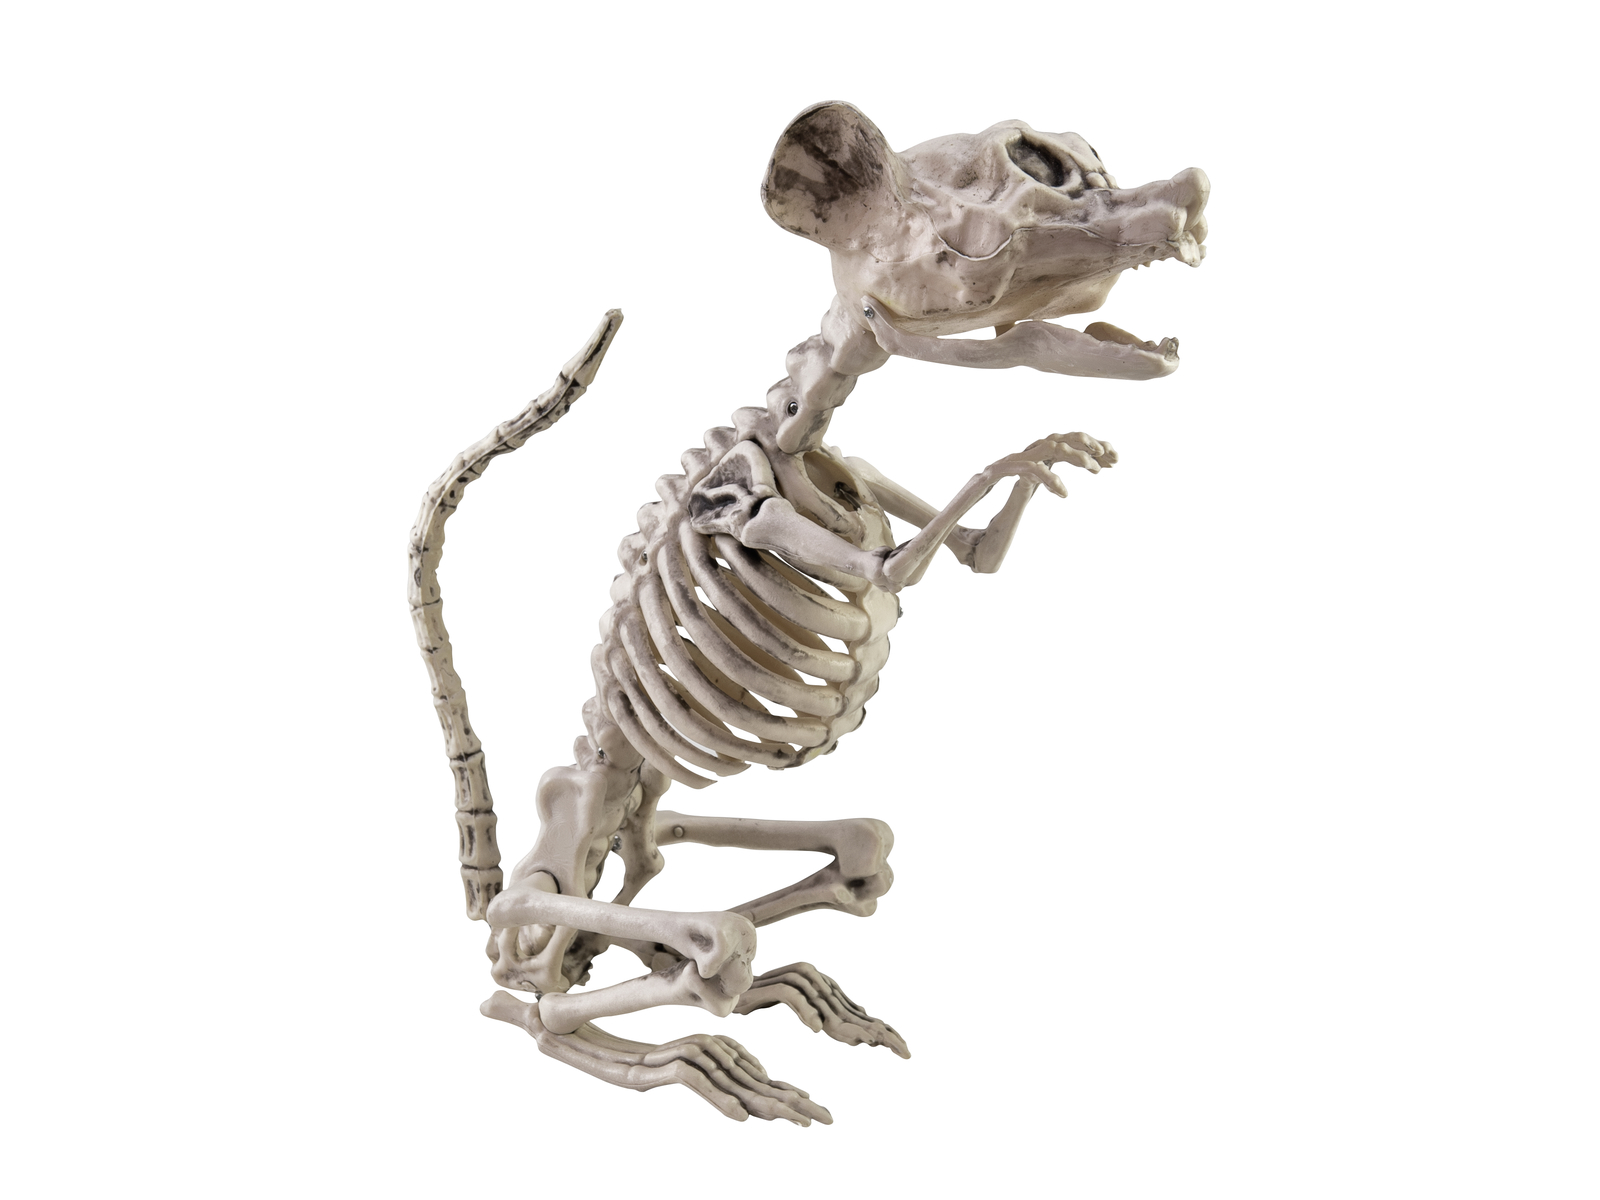 EUROPALMS Halloween Scheletro di Ratto, 32x10x16cm